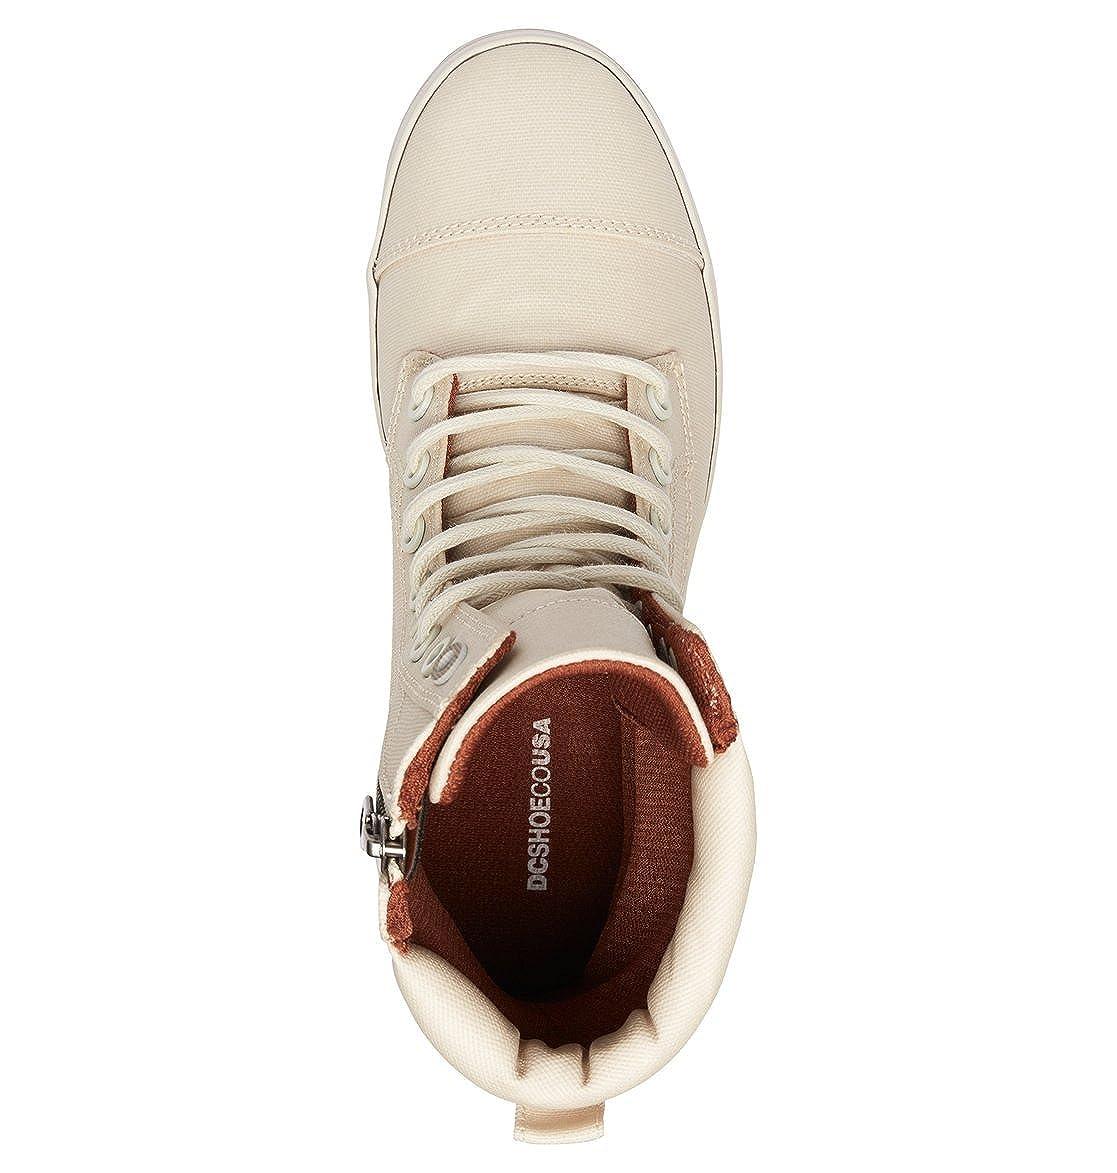 DC schuhe Amnesti TX SE - Stiefel for damen - - - Stiefel - Frauen - EU 37.5 - Weiss bf0399